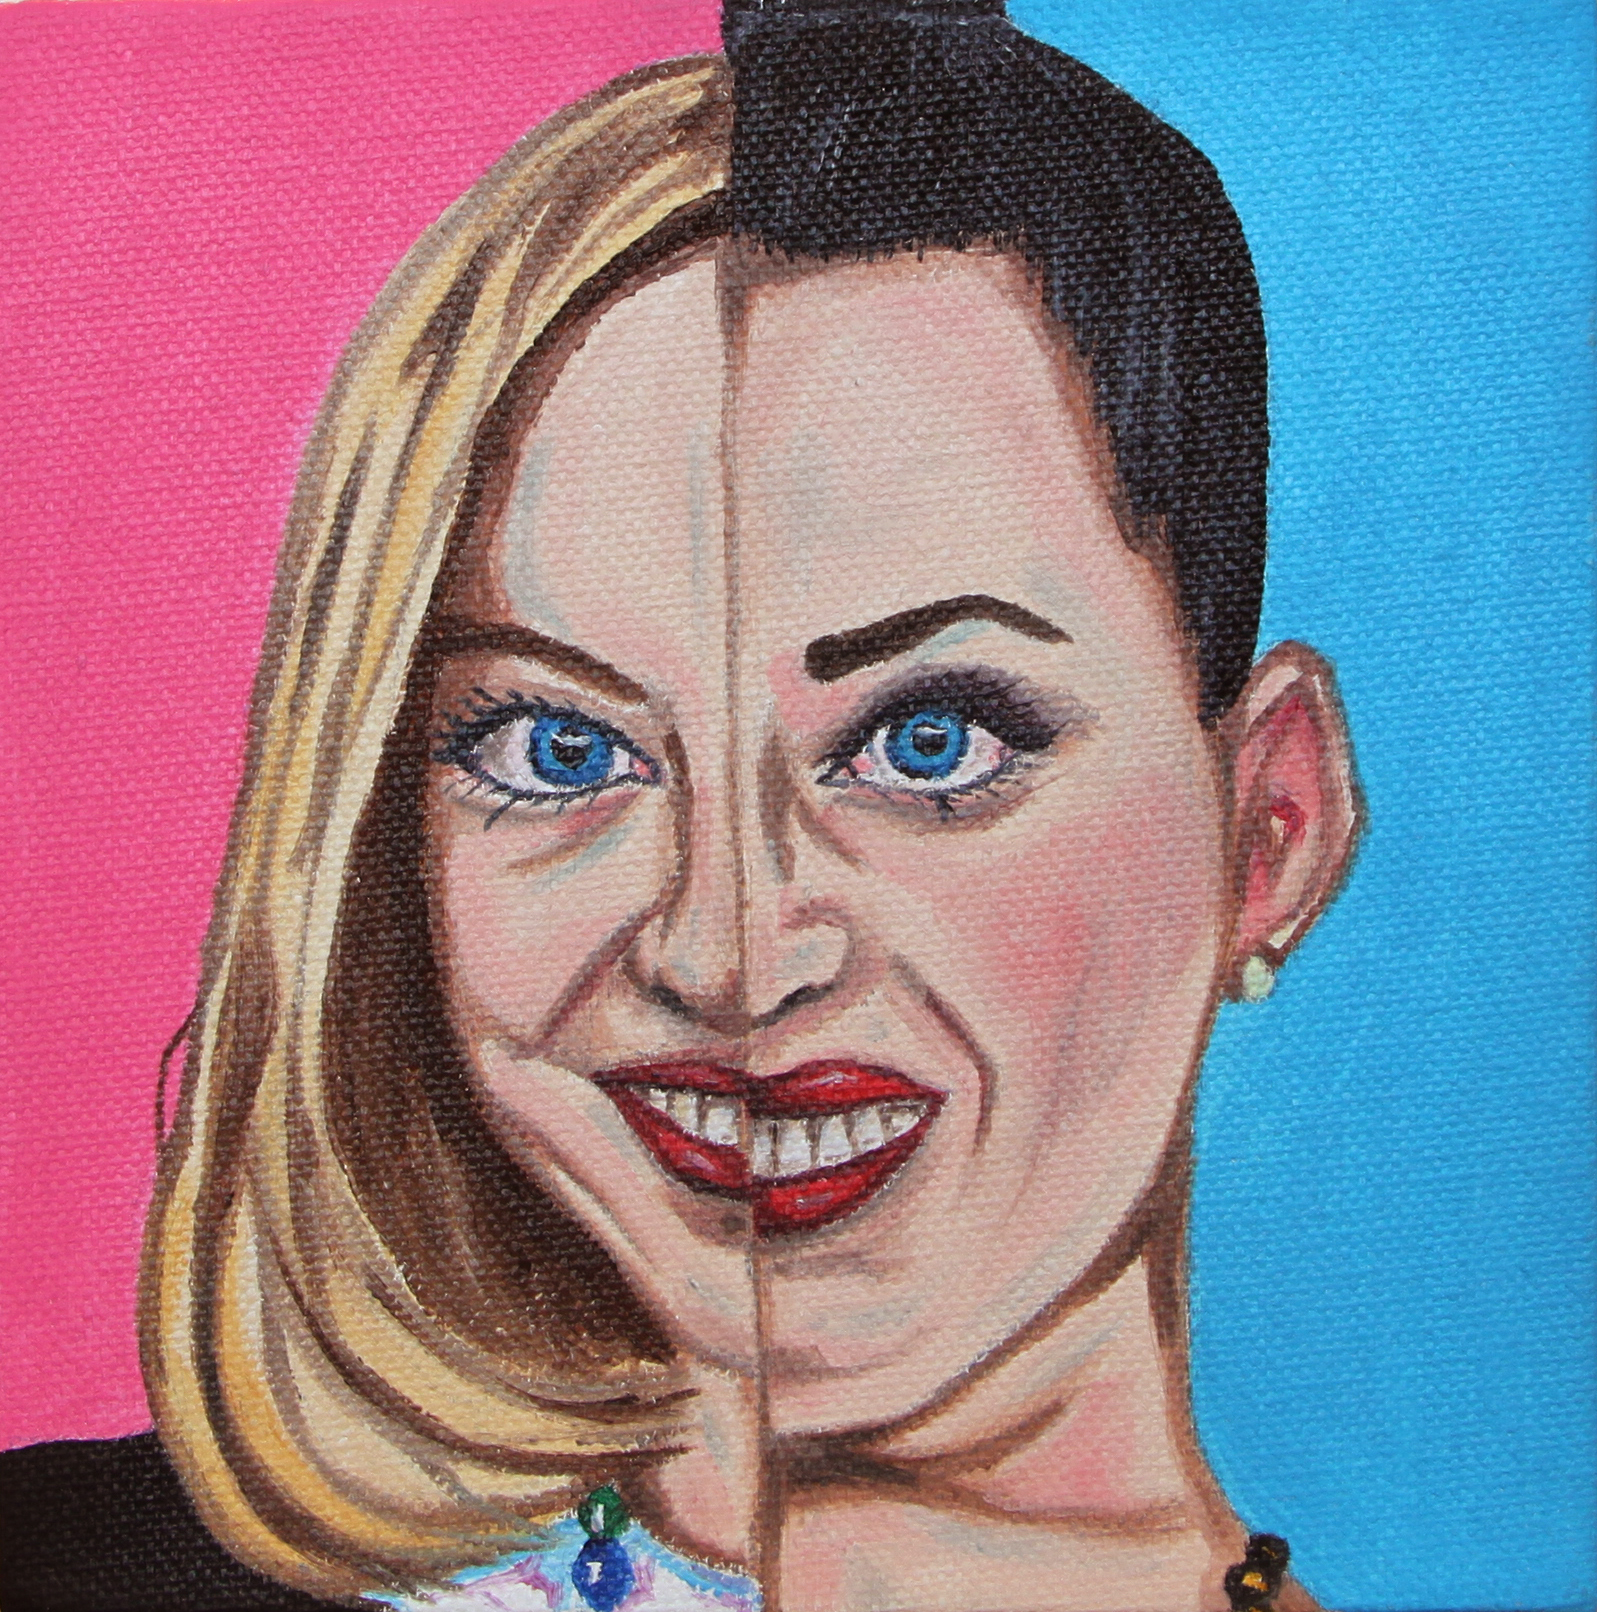 Me + Katy Perry